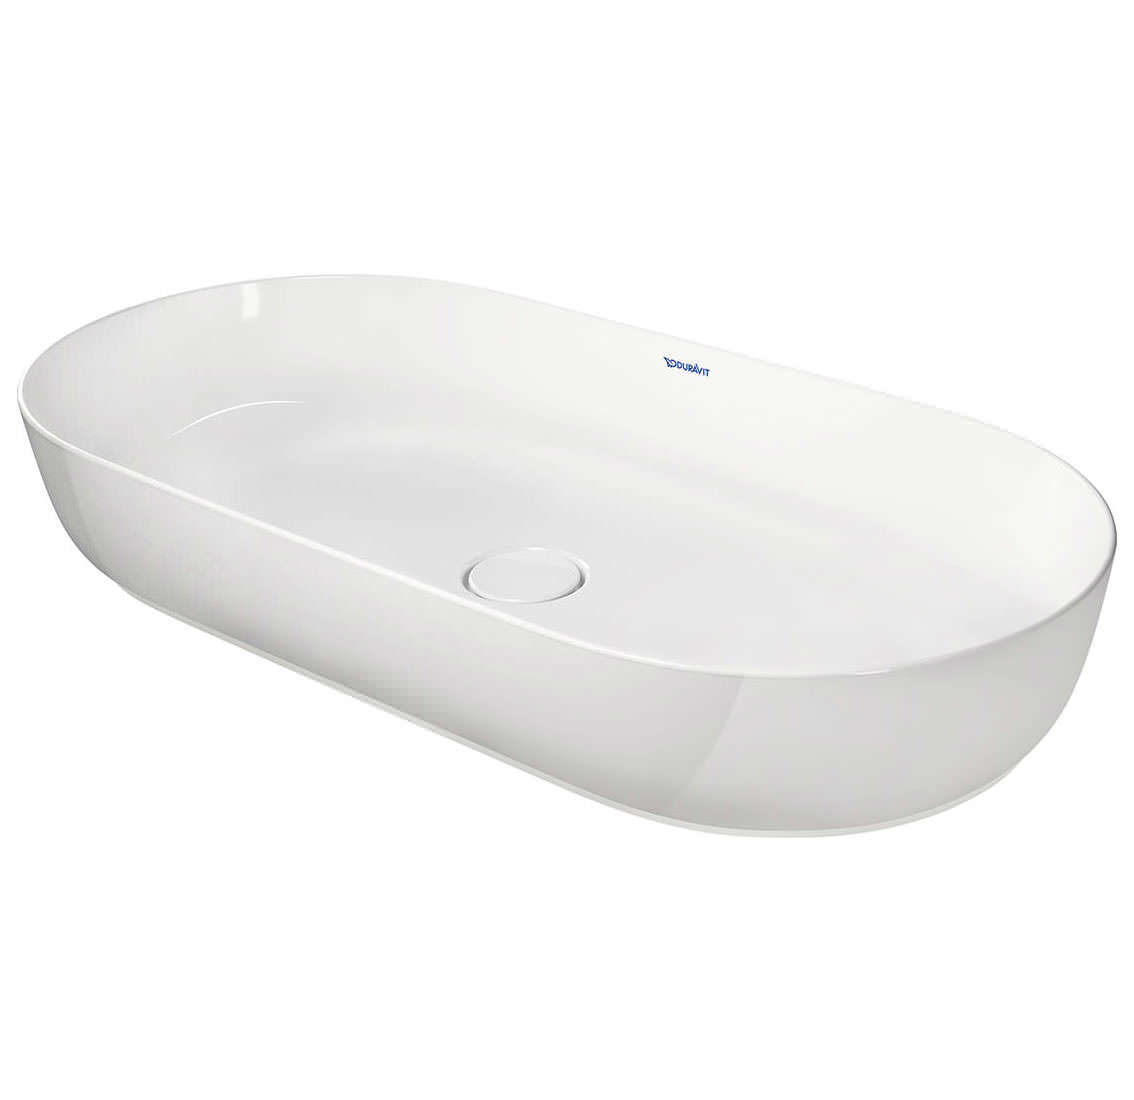 duravit luv 800 x 400mm ground wash bowl more finish. Black Bedroom Furniture Sets. Home Design Ideas